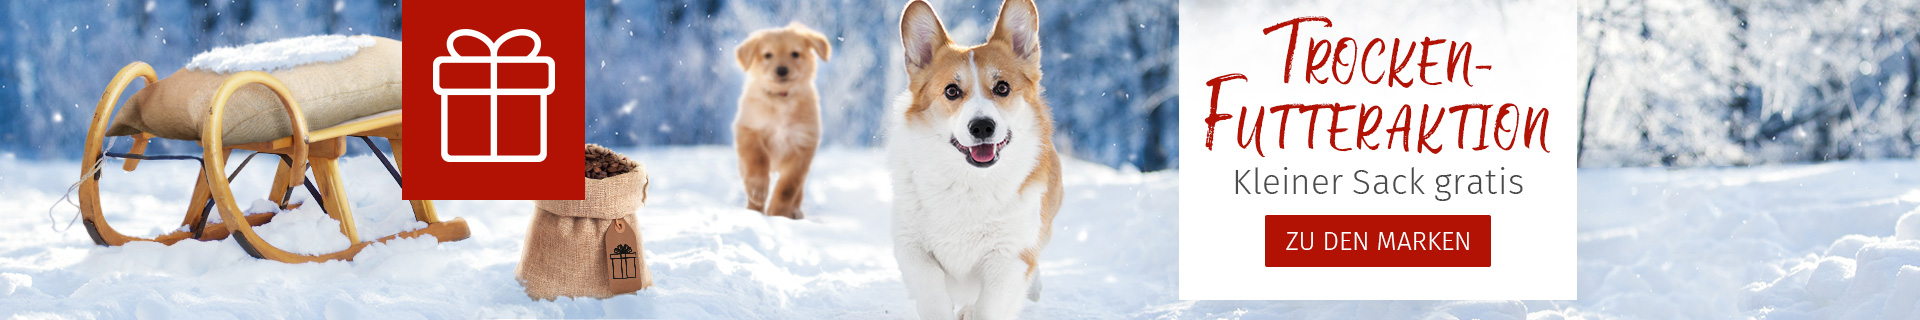 Trockenfutter Aktion für Hunde - Kleiner Sack gratis